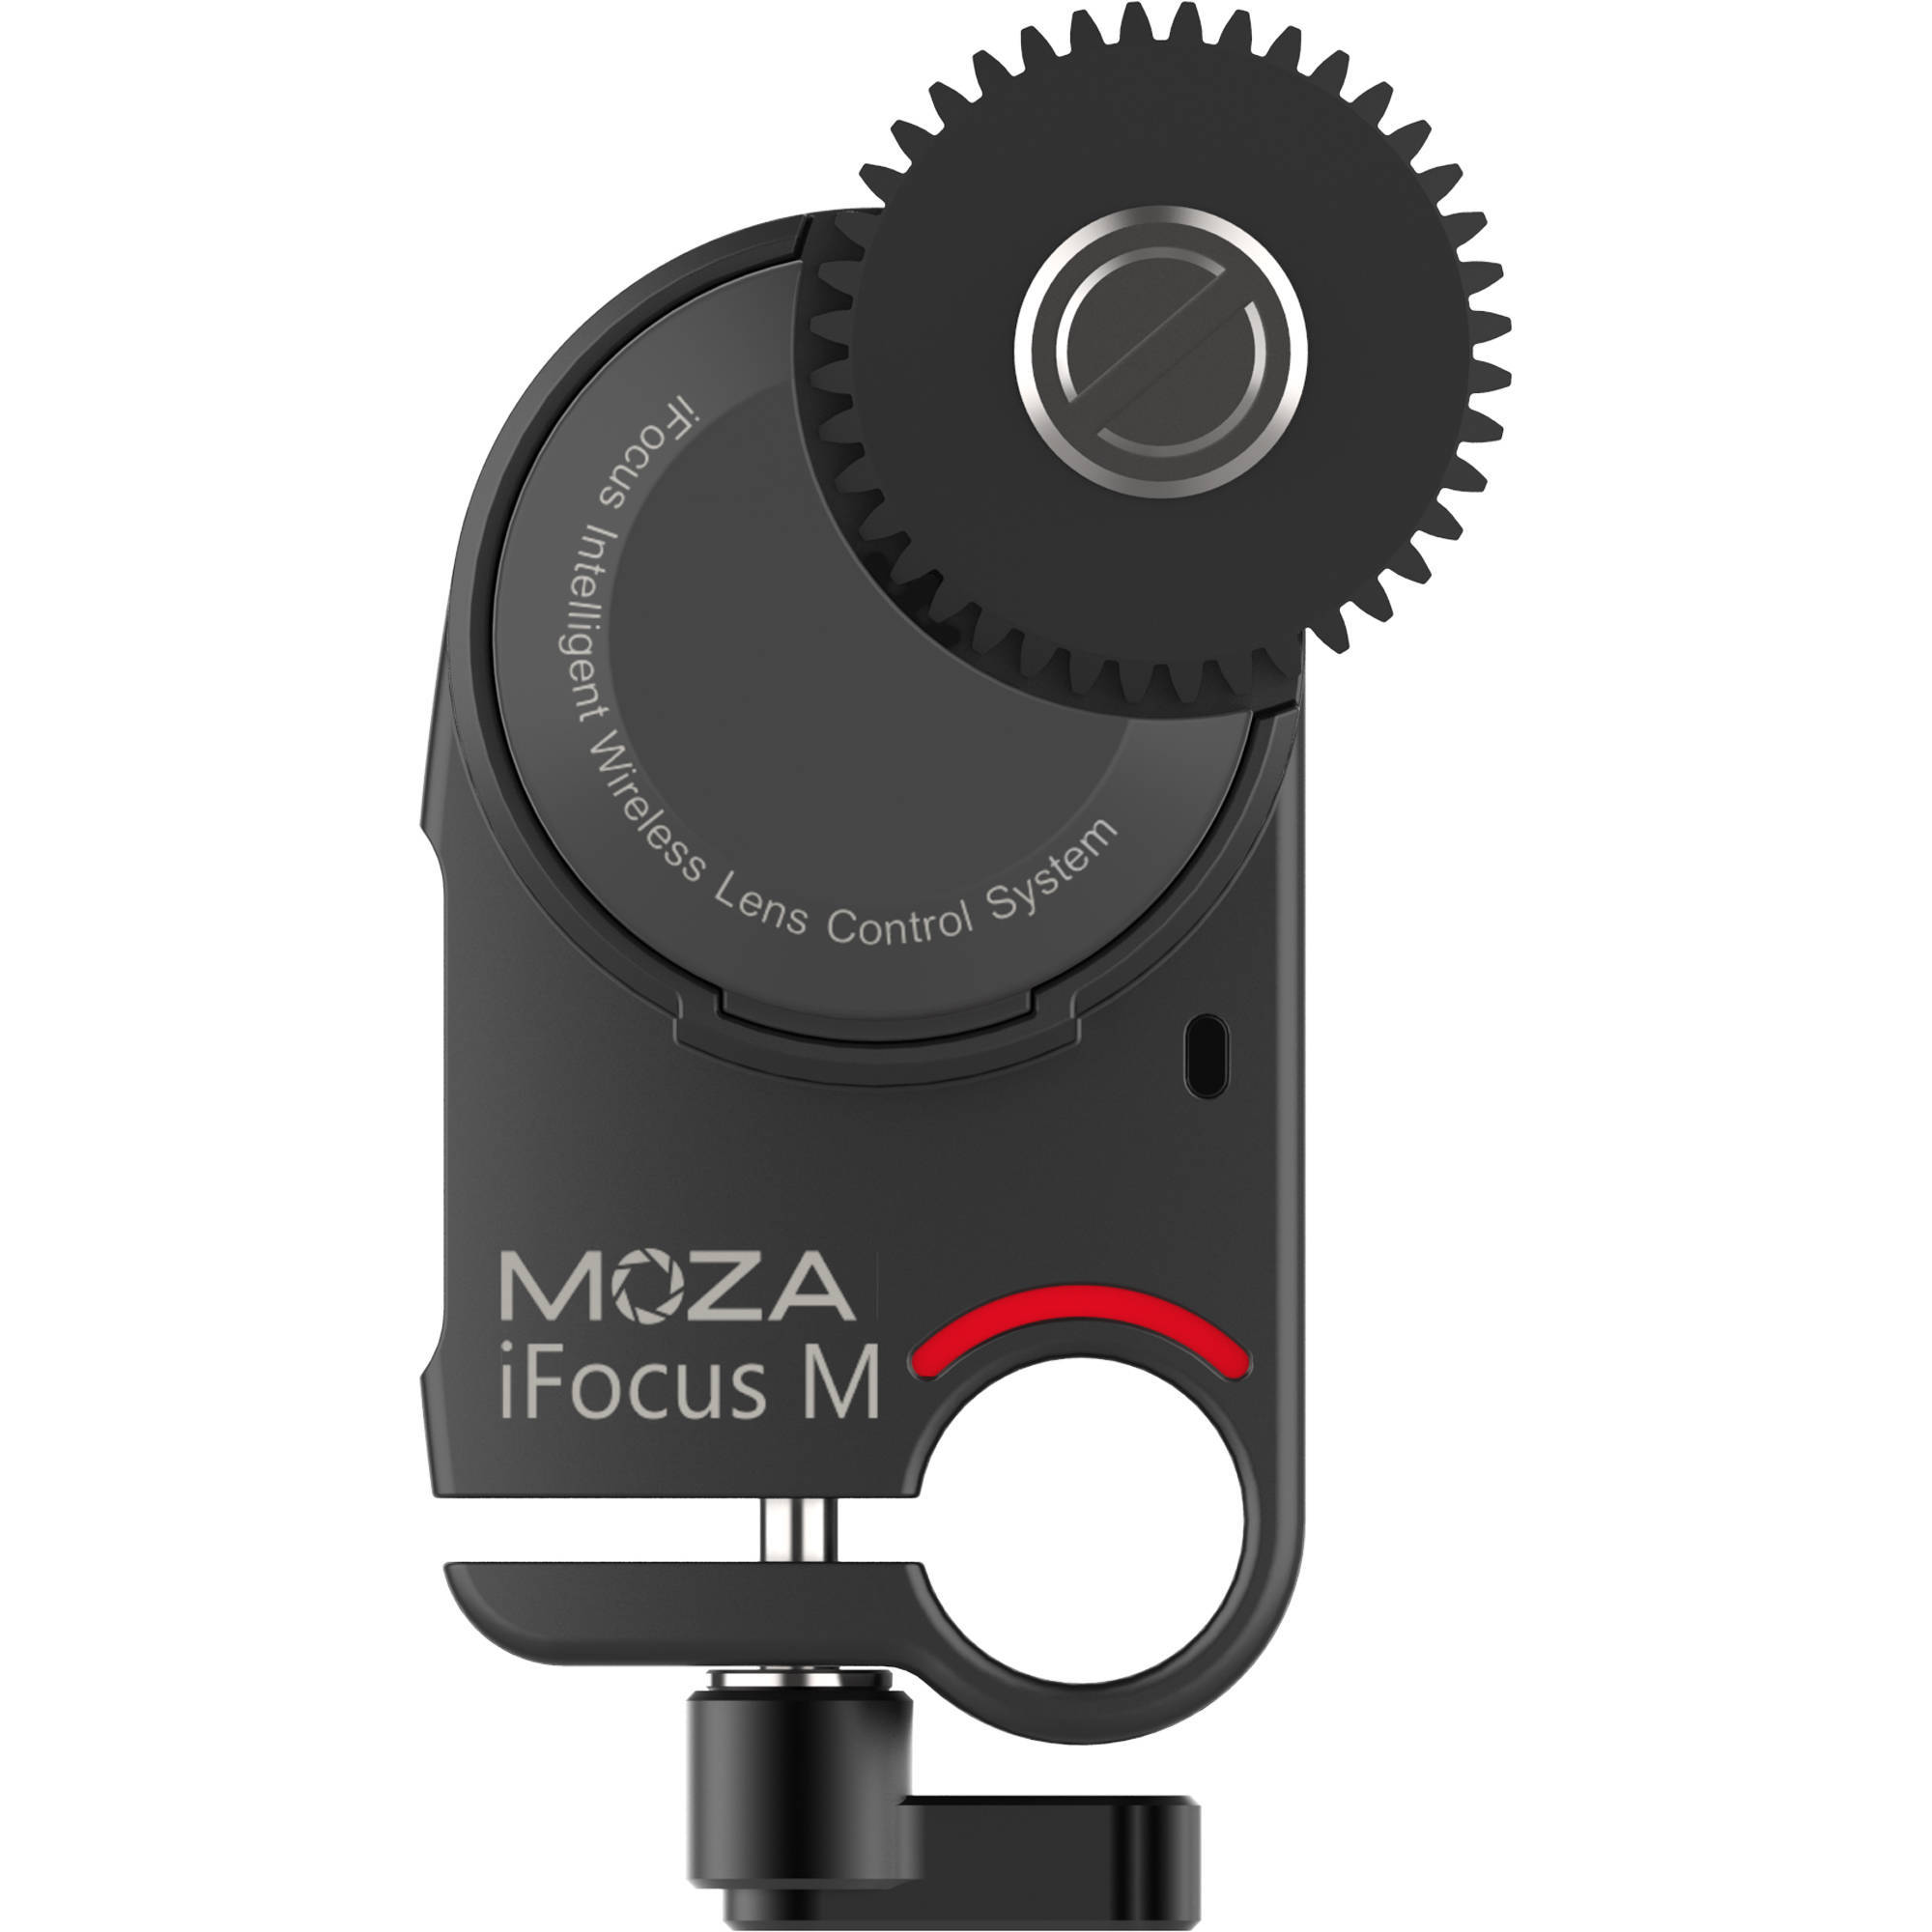 Moza Moza iFocus M 111.jpg